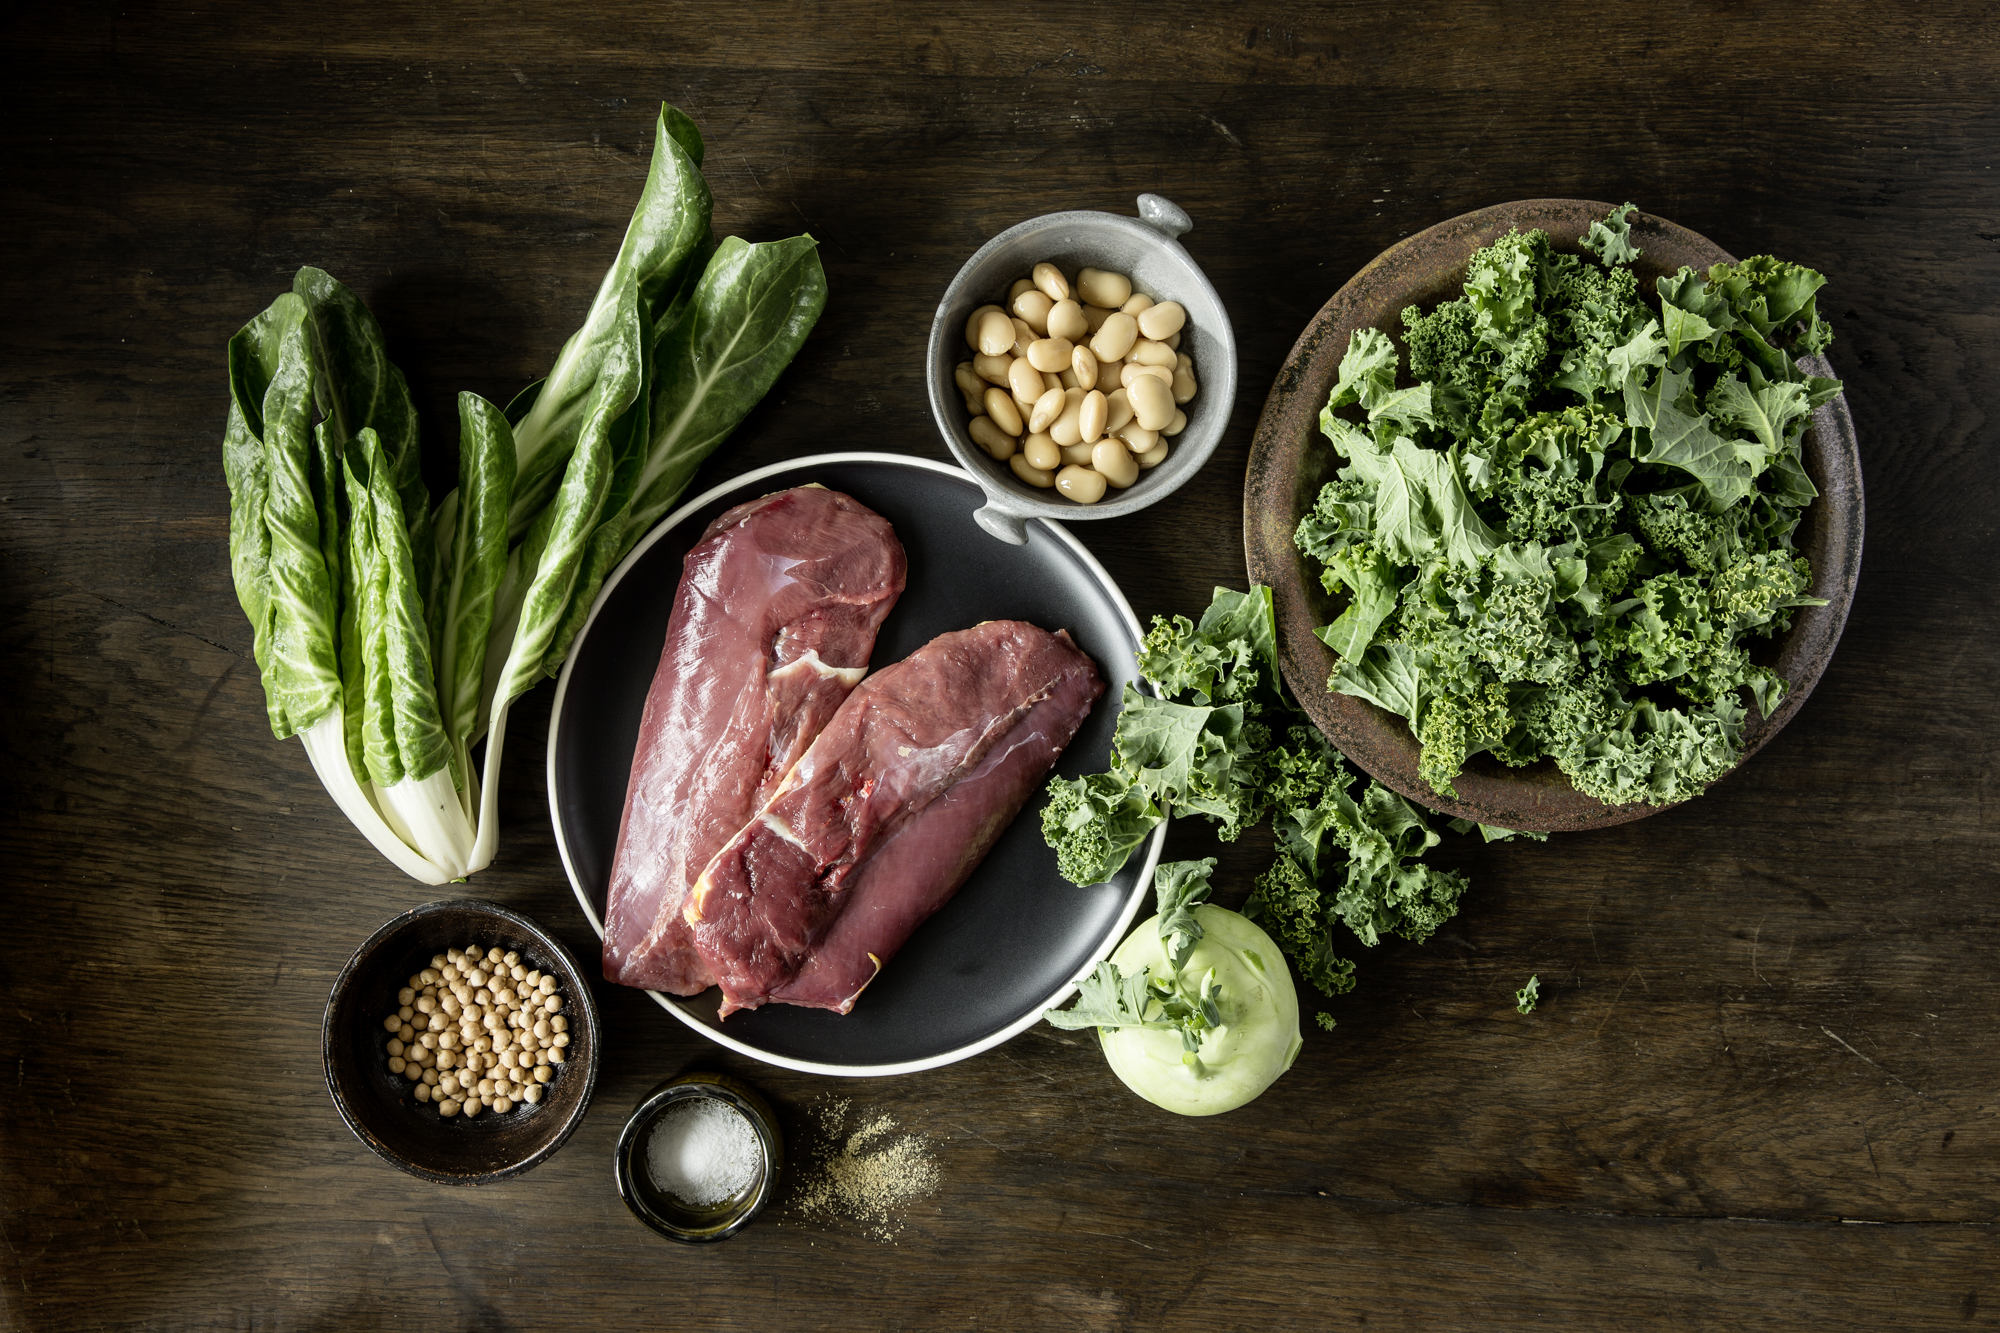 Food-Fotografie Meatlove, Stefan Schmidlin Fotograf Basel; Bild 18.jpg